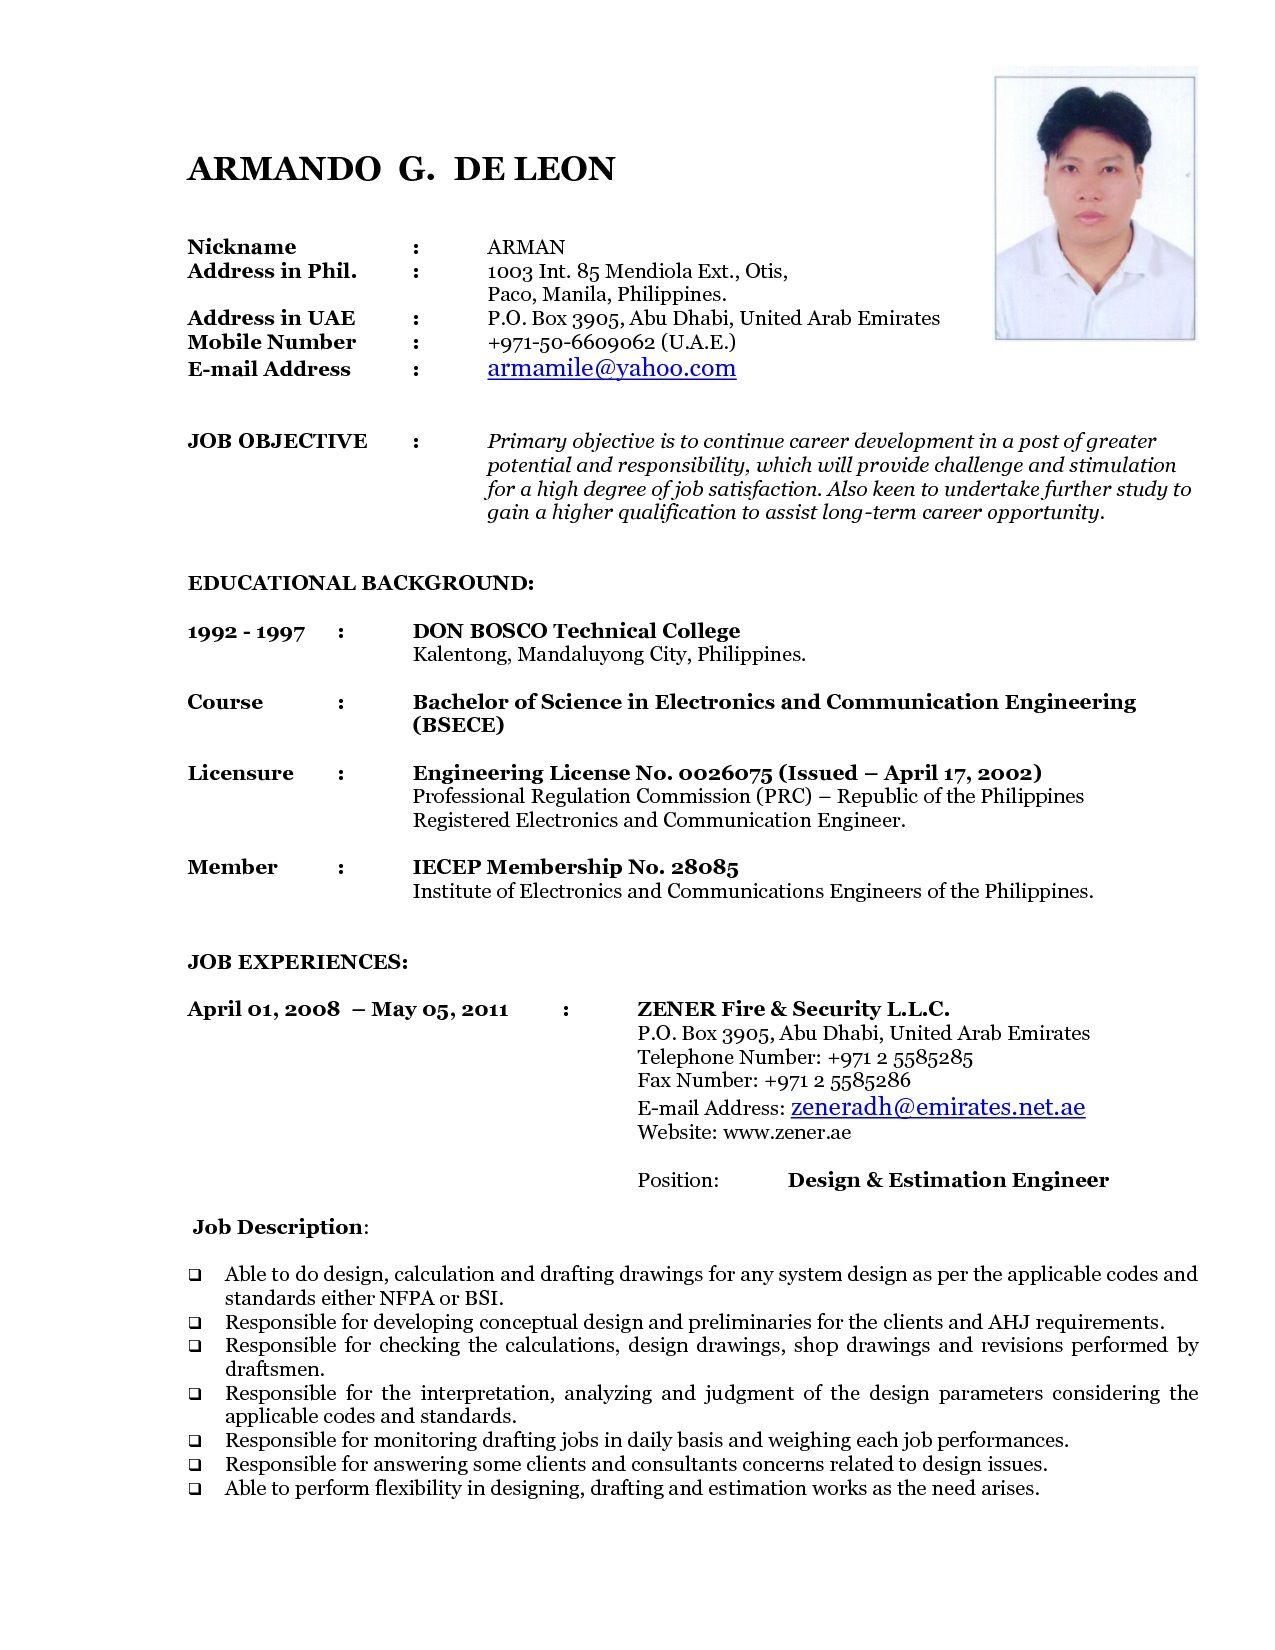 seaman resume template